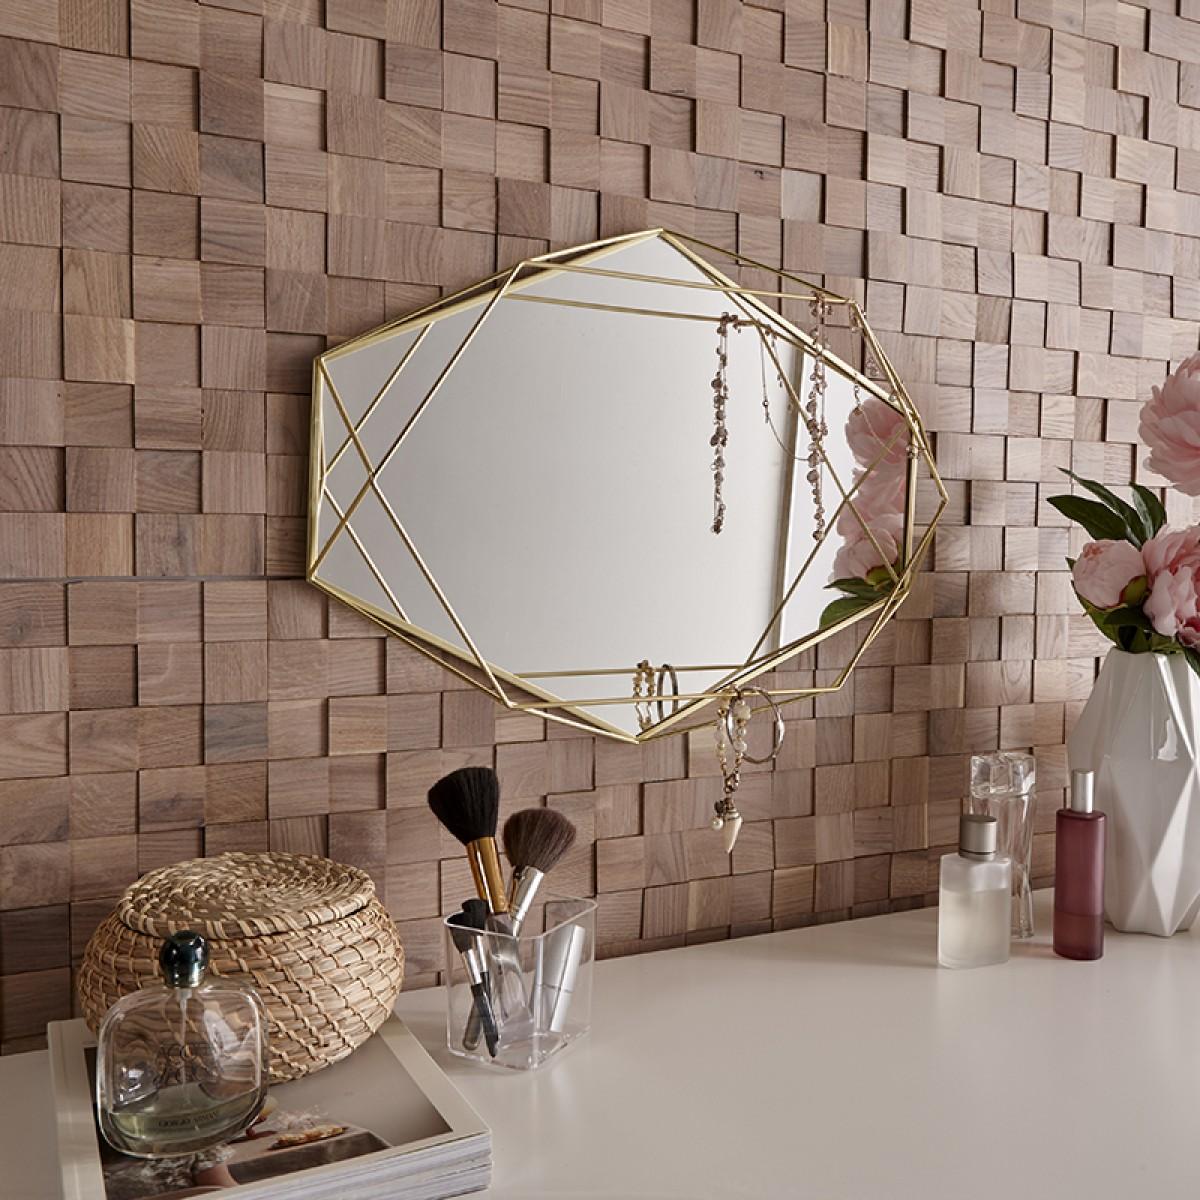 Panouri decorative din lemn Mosaic - Chessboard Oak White - 4 plăci